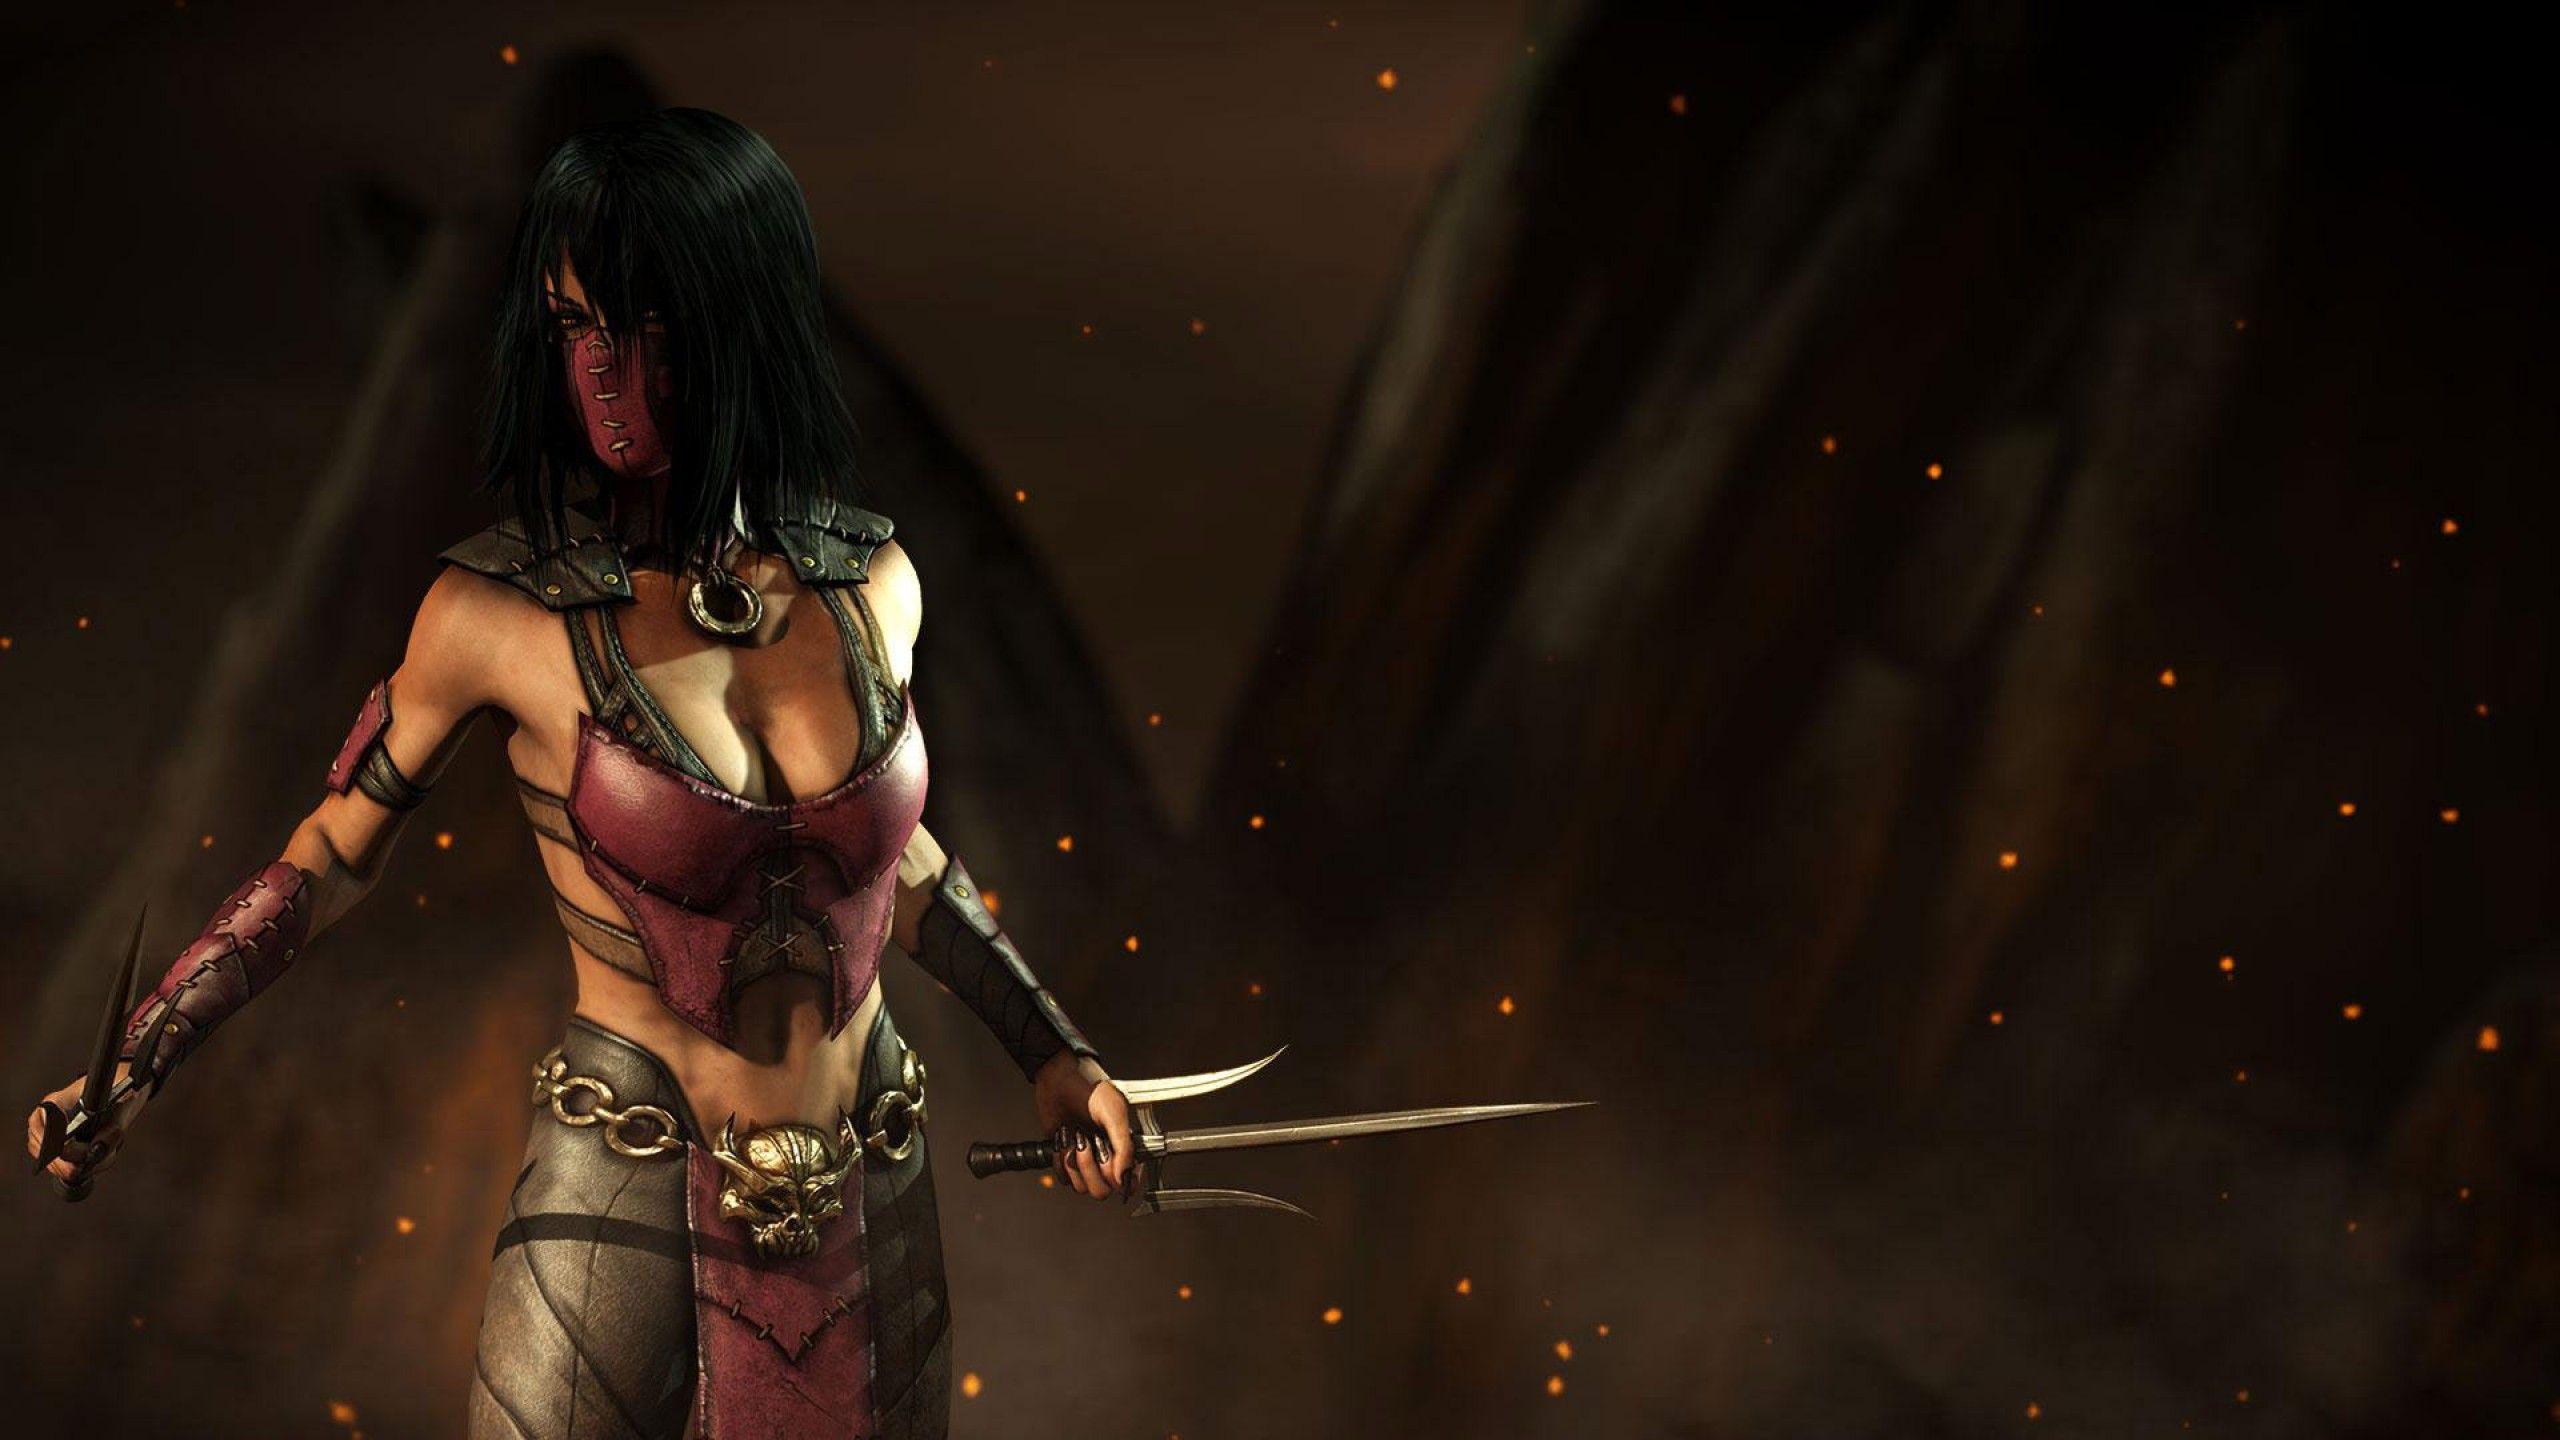 Pin By Cody Shaw On Mortal Kombat Mortal Kombat X Wallpapers